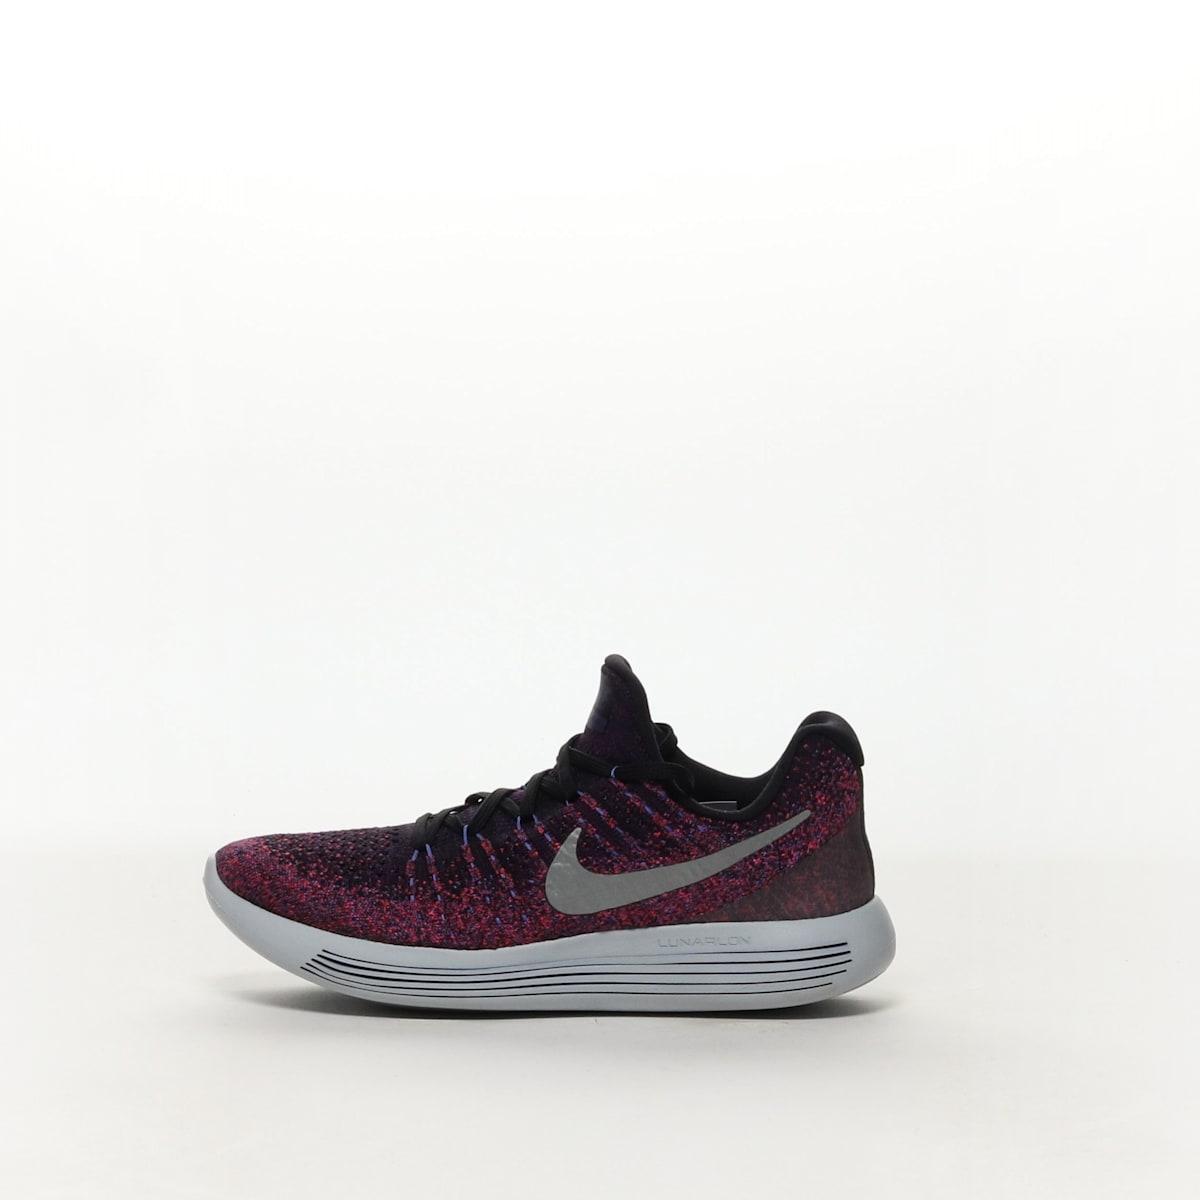 39d52804d62 Women s Nike LunarEpic Low Flyknit 2 Running Shoe - BLACK METALLIC ...